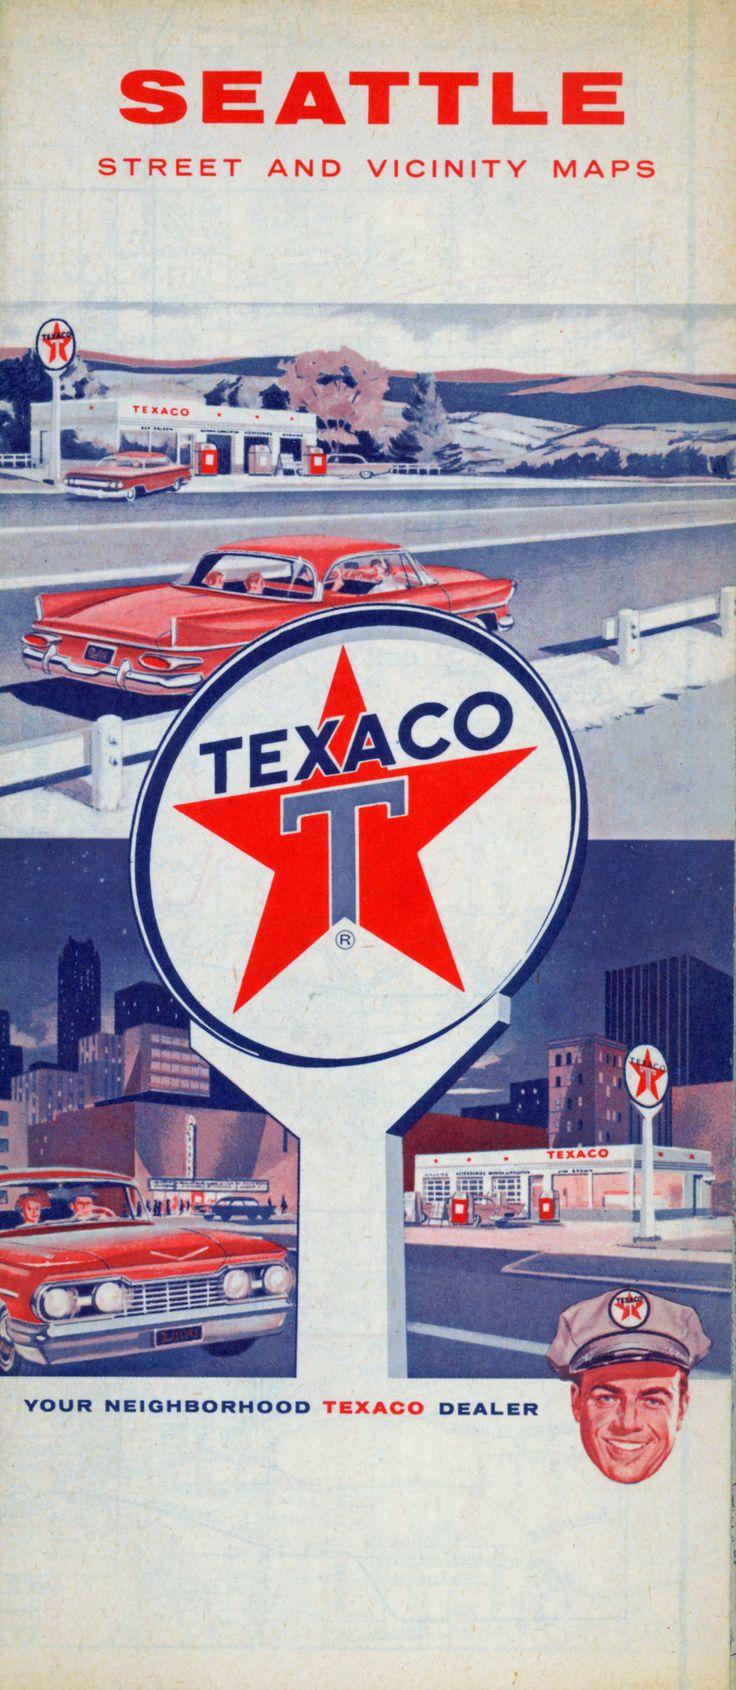 Texaco map of Seattle, 1962